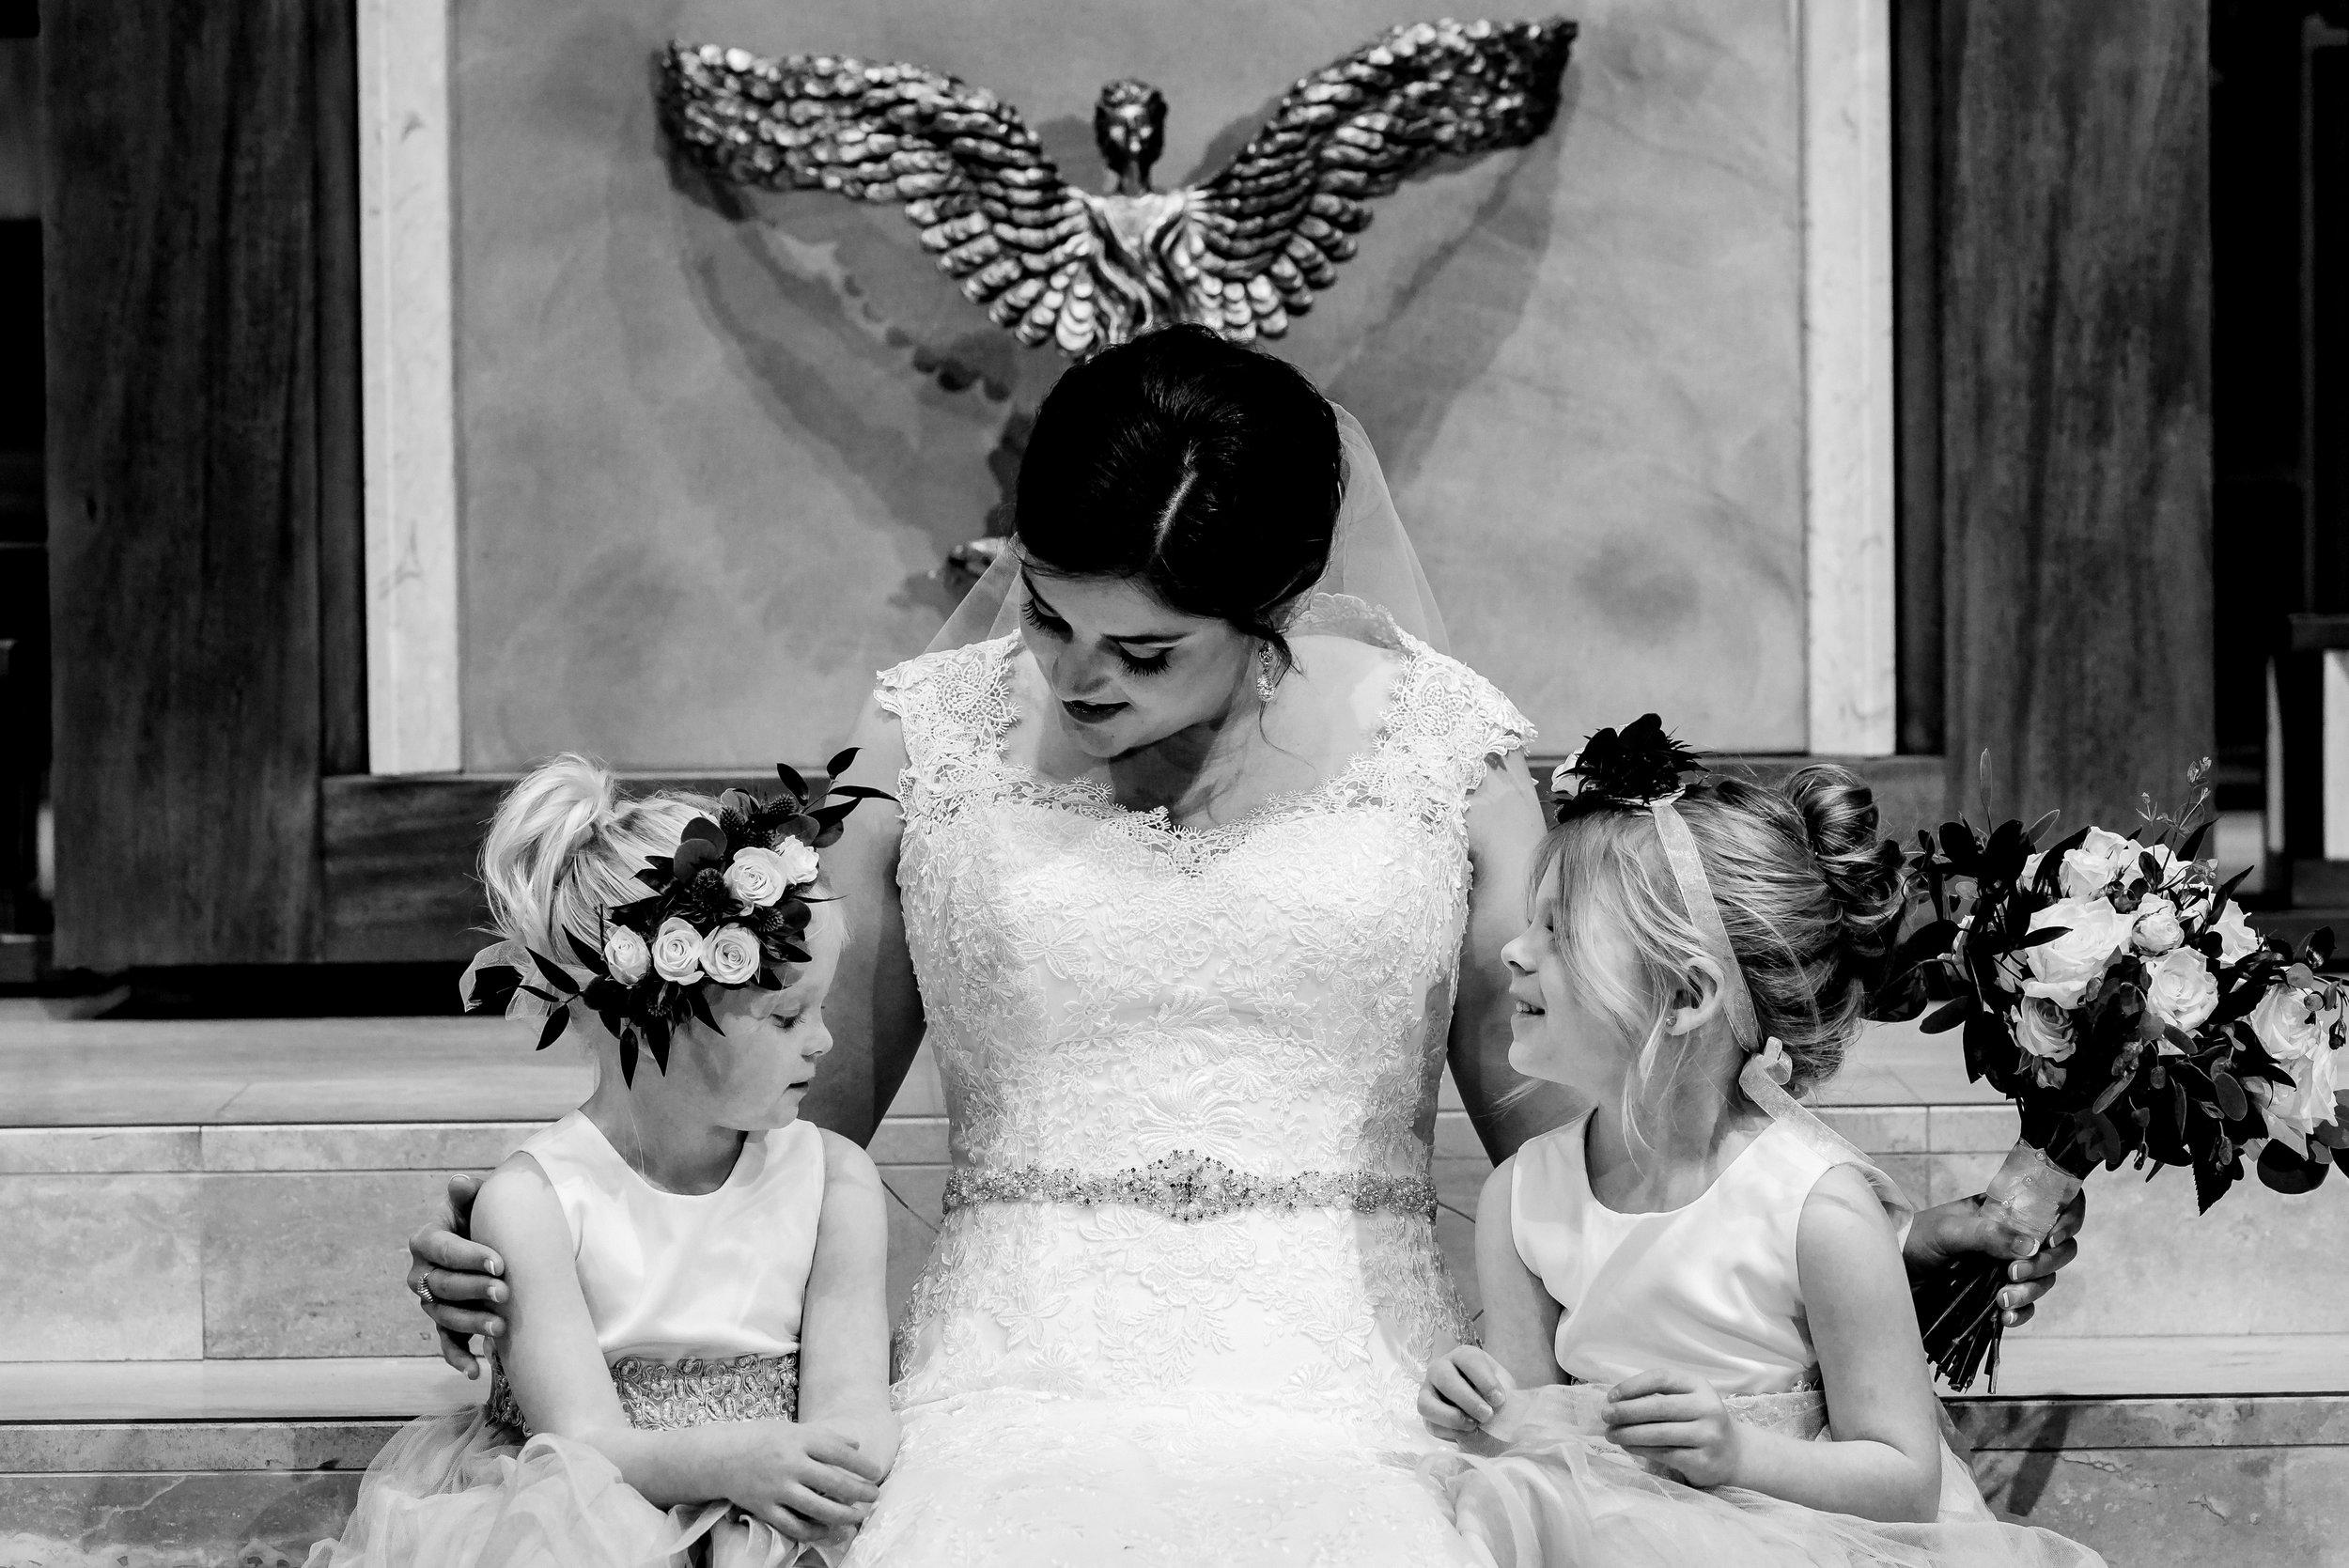 Lauren and Karl - Van Dusen Mansion Wedding and St. Olaf Catholic Church Minneapolis Wedding BW-356.jpg